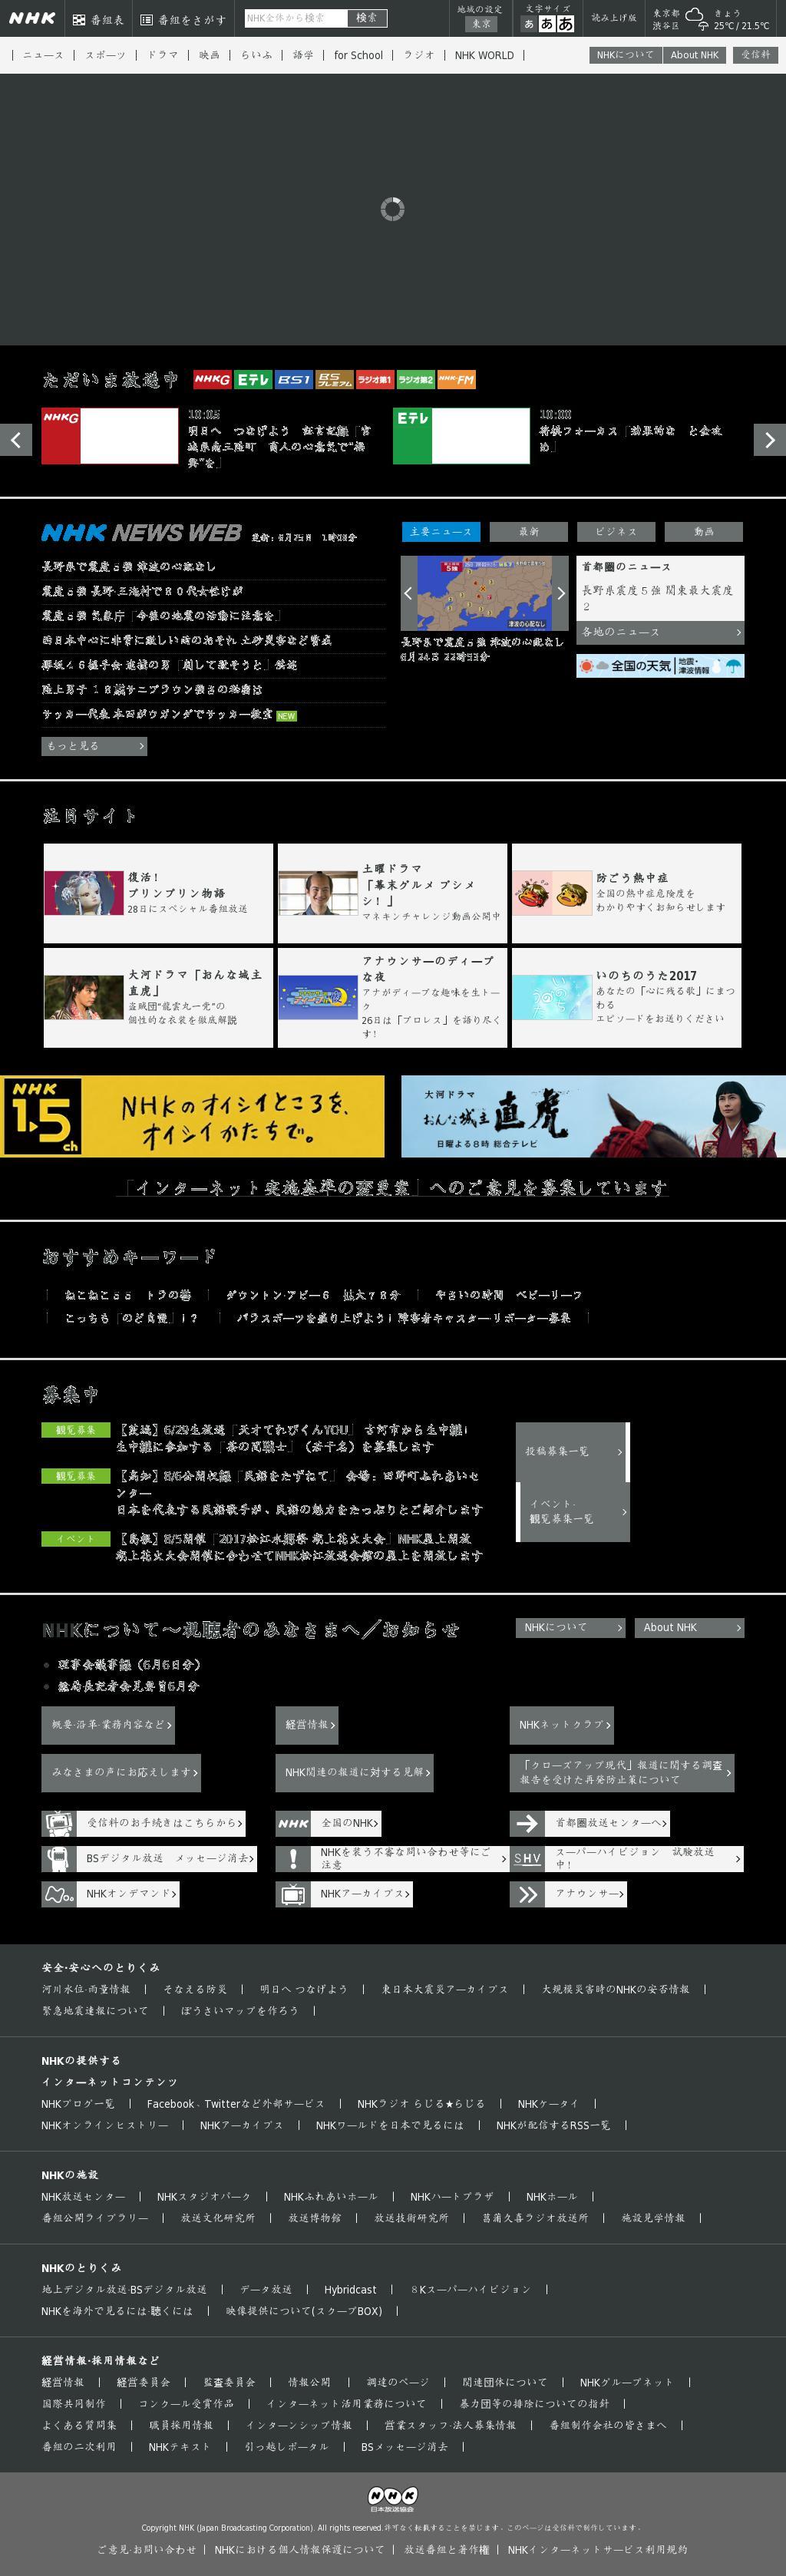 NHK Online at Sunday June 25, 2017, 1:10 a.m. UTC